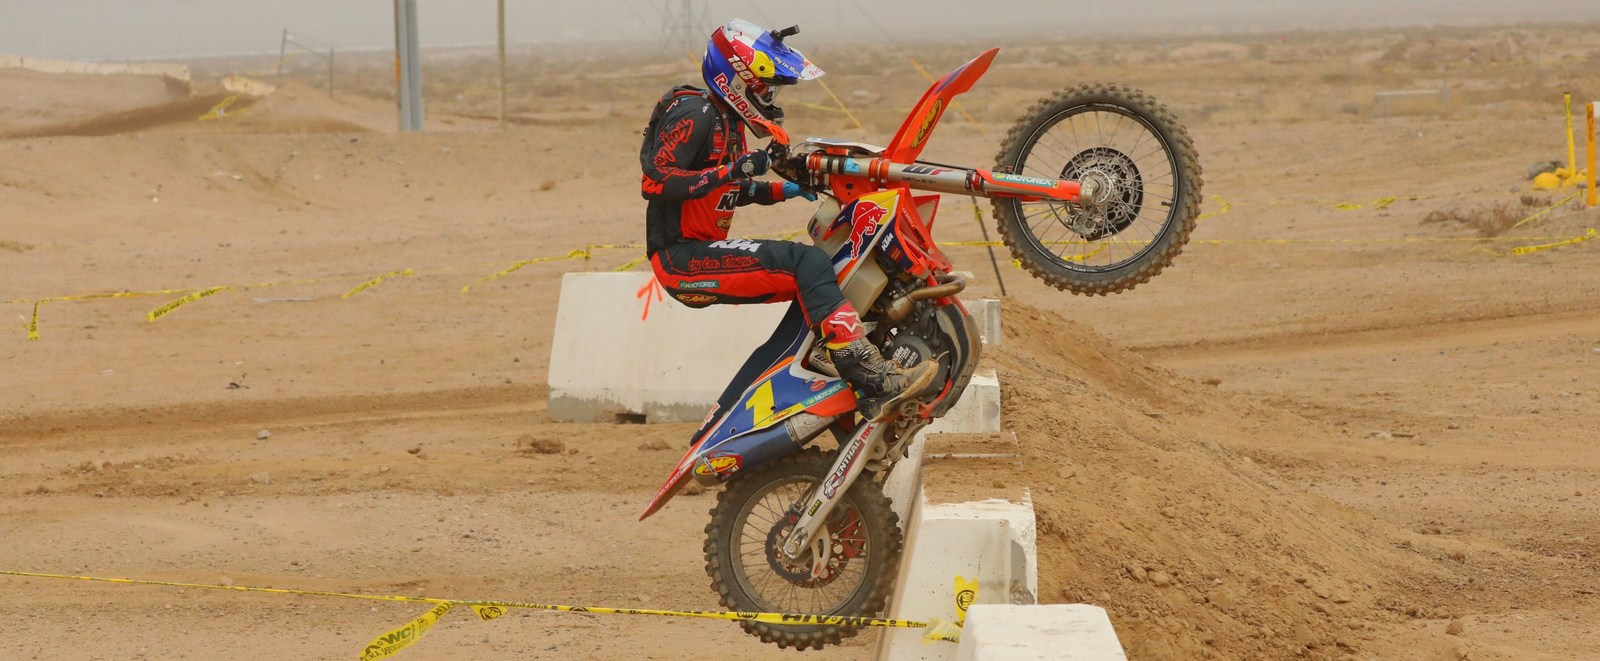 2020-01-taylor-robert-k-rail-bike-worcs-racing